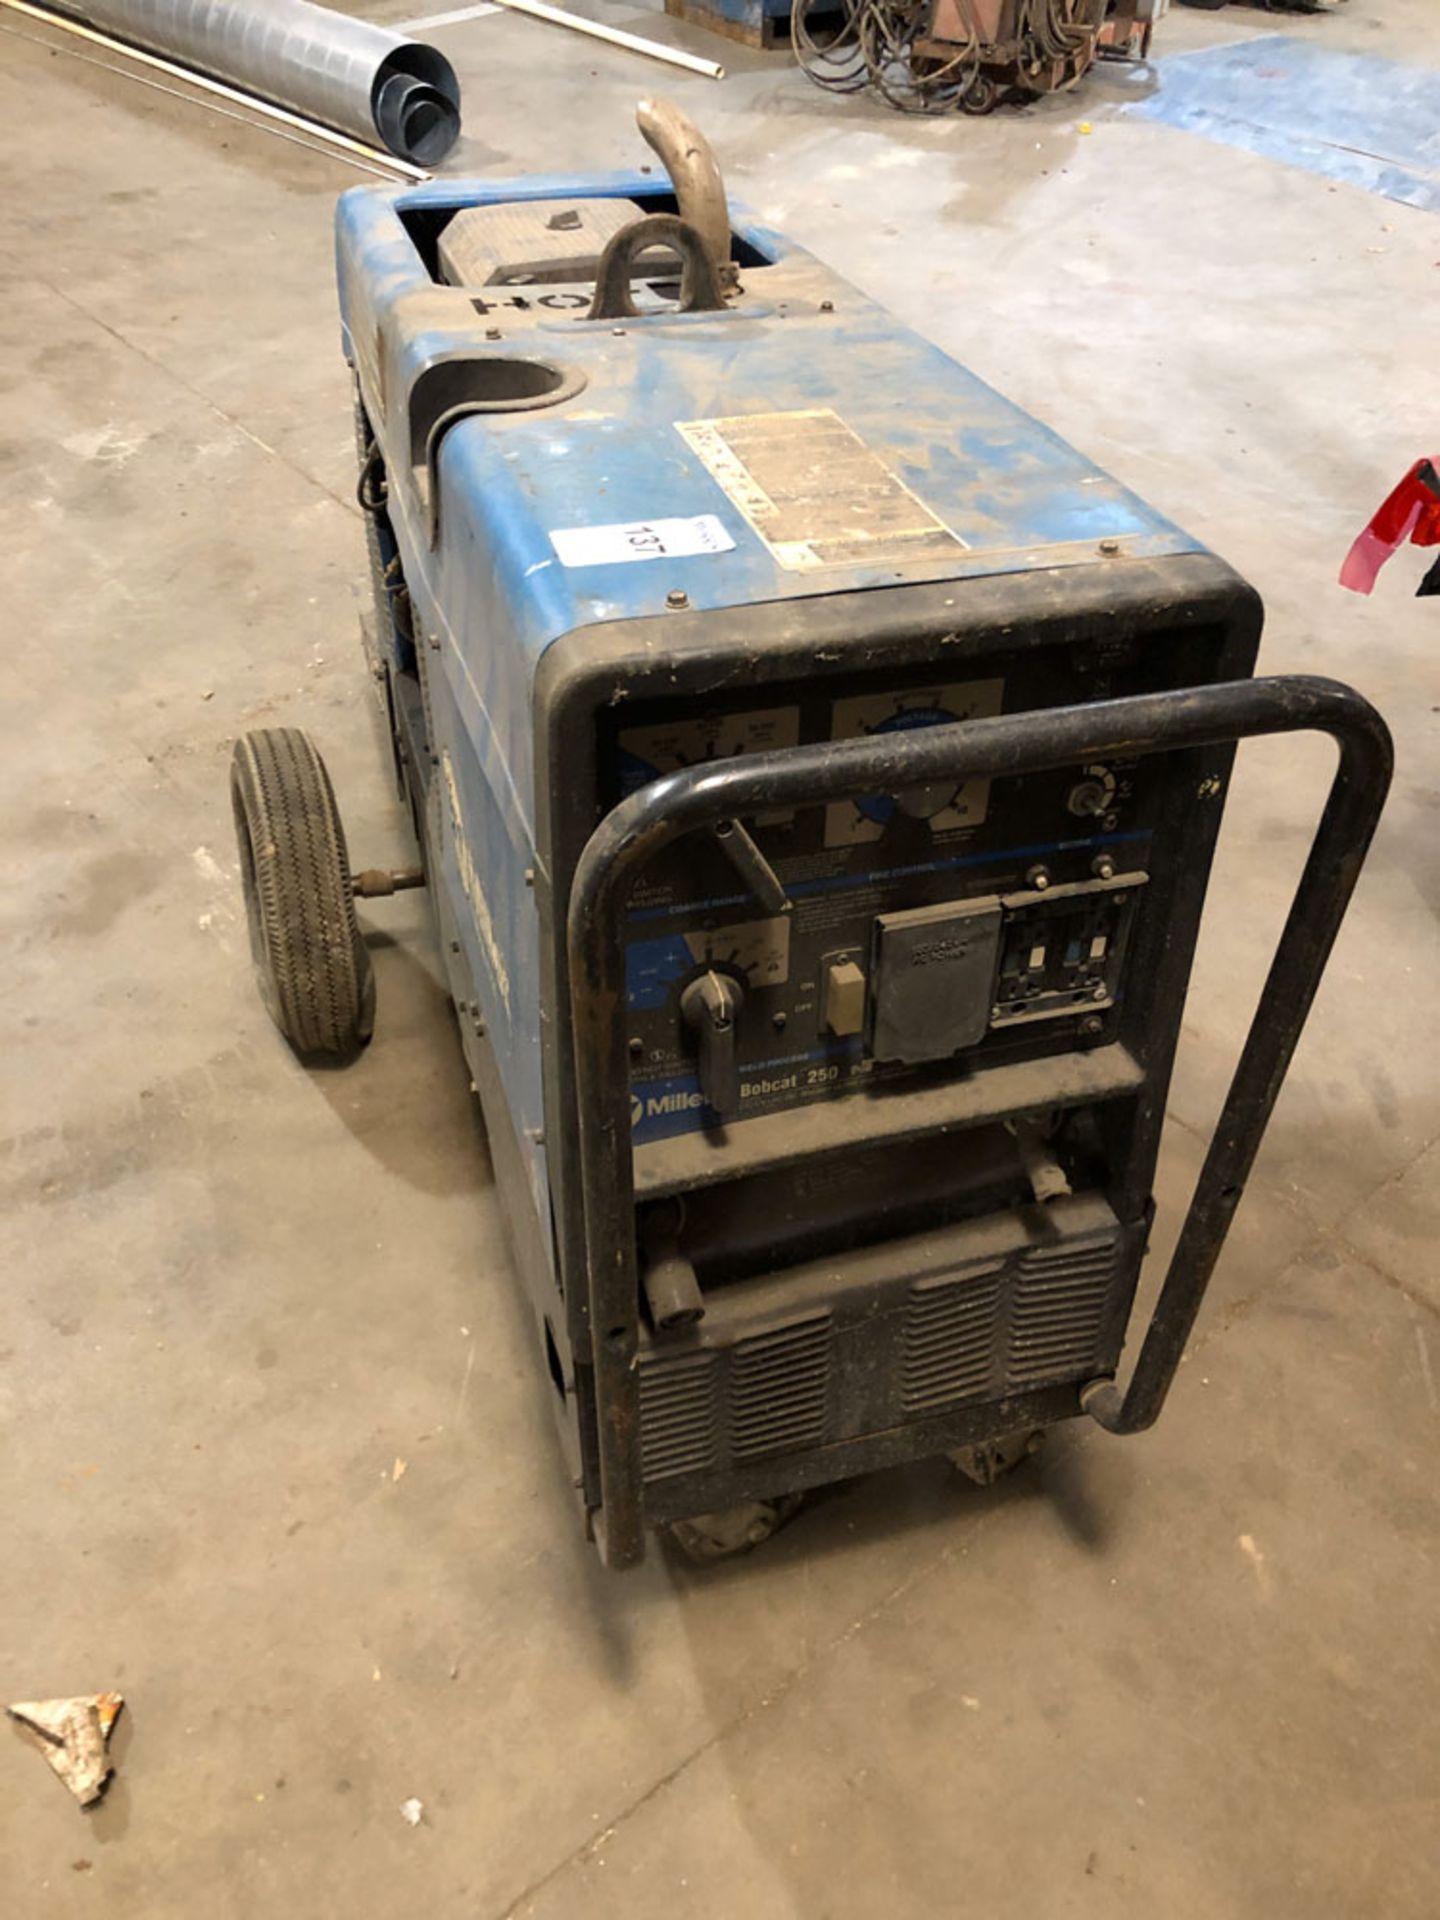 Lot 137 - Welder, Miller Bobcat 250 NT Propane Powered